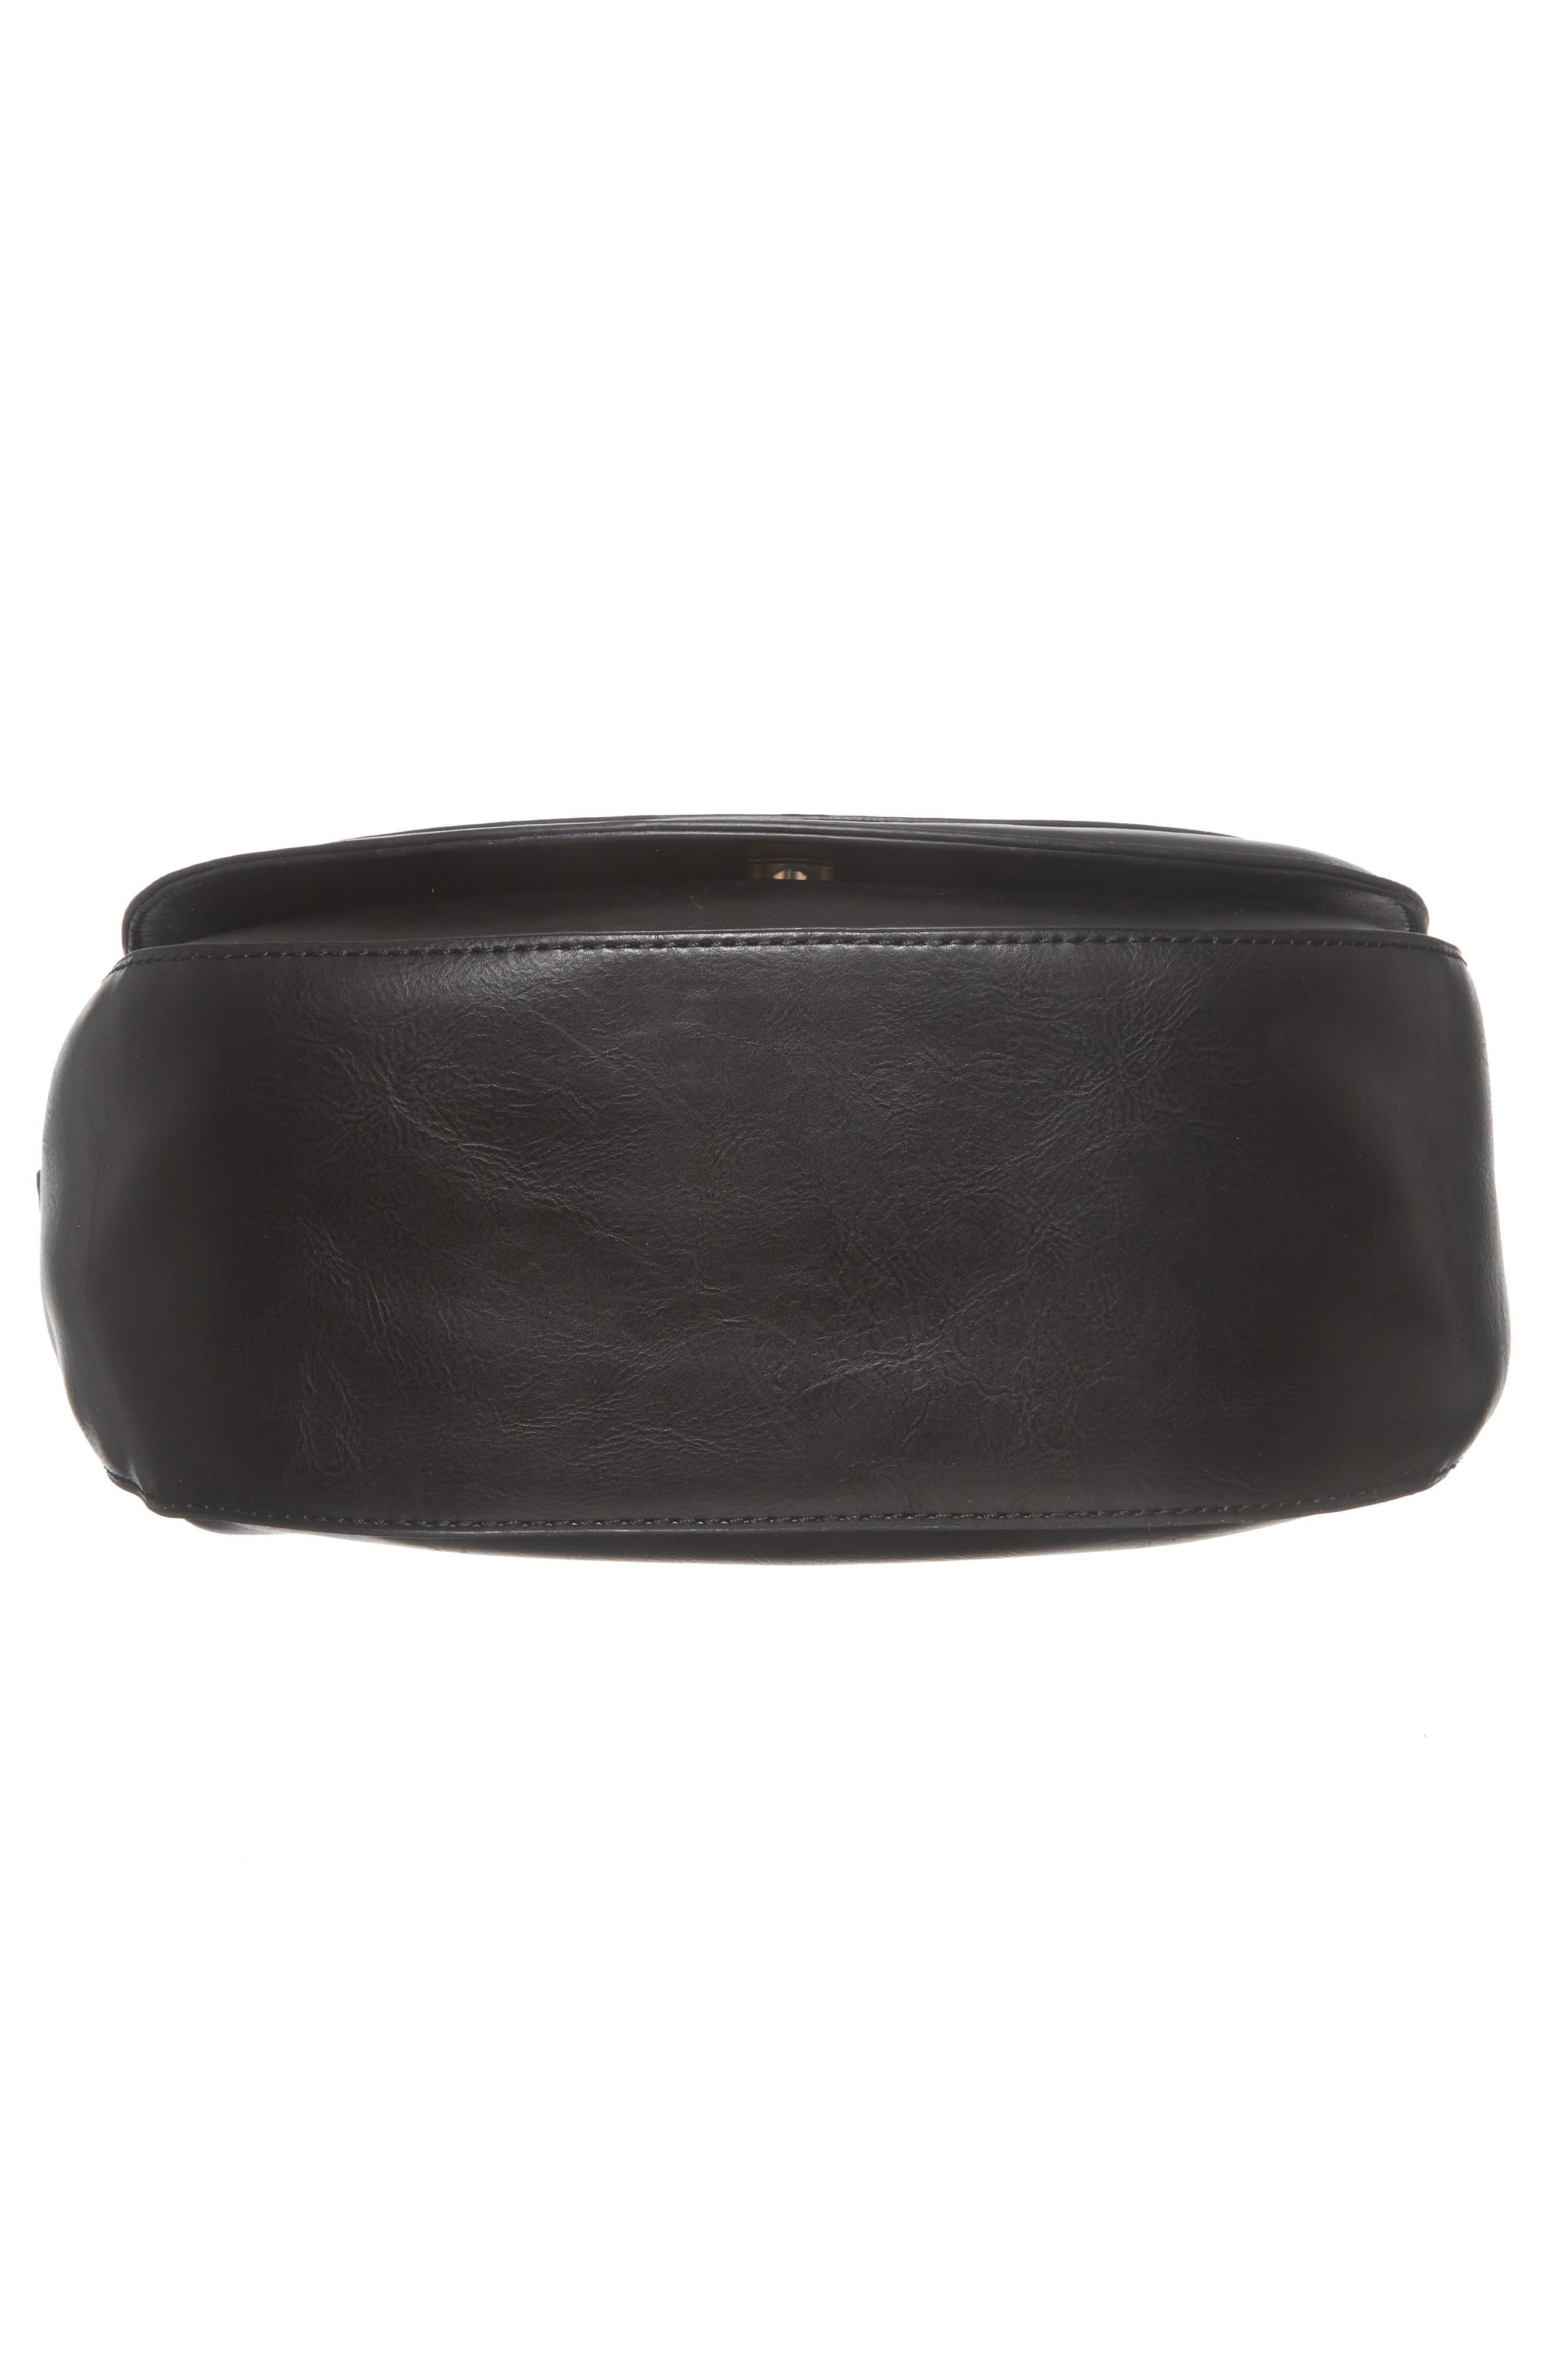 Piri Faux Leather Saddle Bag,                             Alternate thumbnail 6, color,                             001